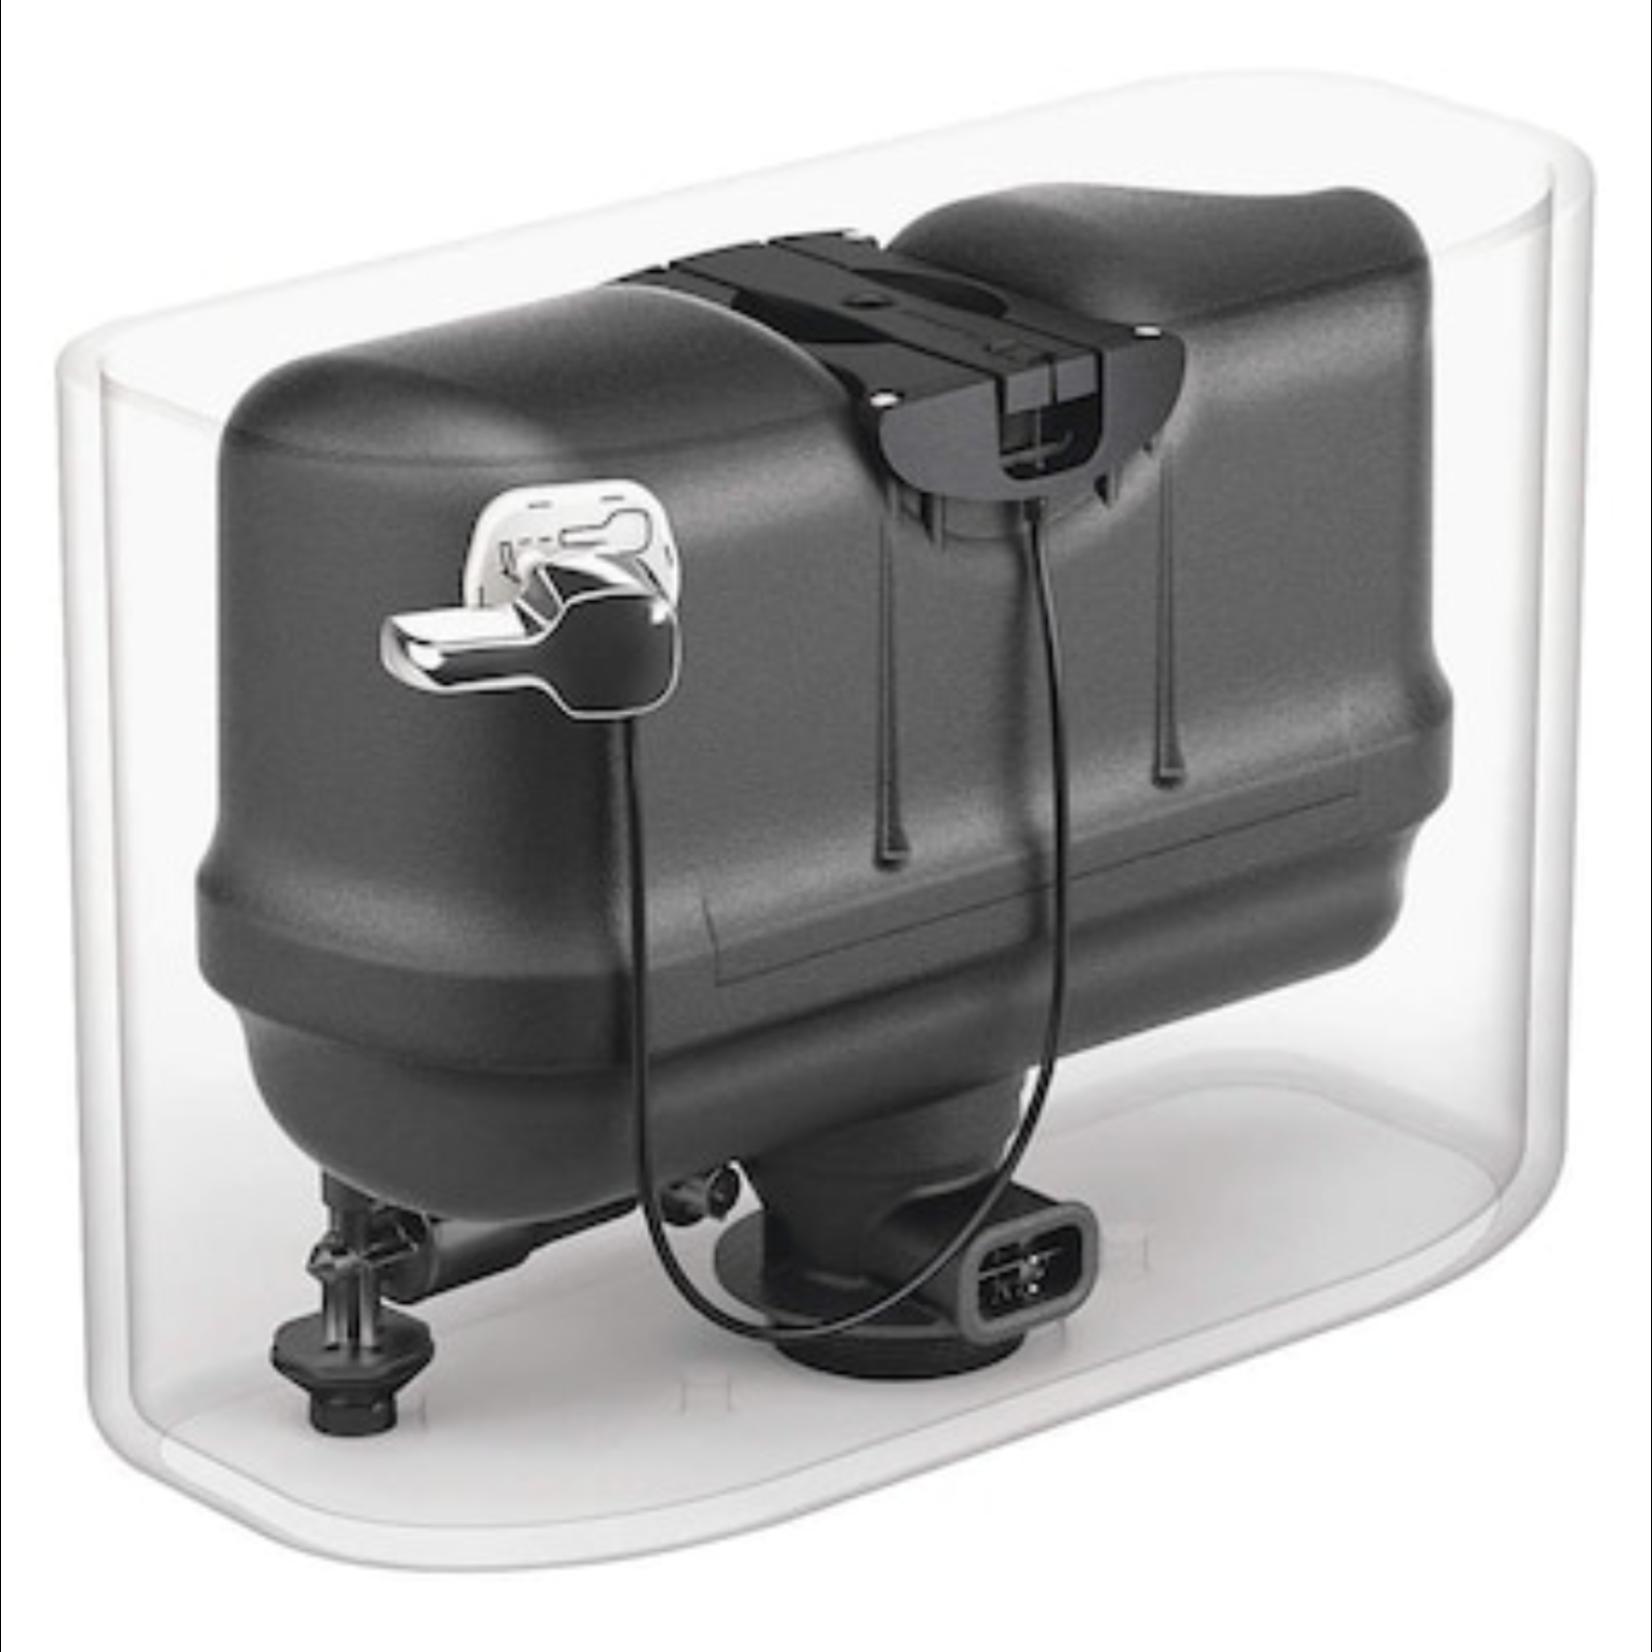 10312 Sloan Universal Pressure-Assist Flush System